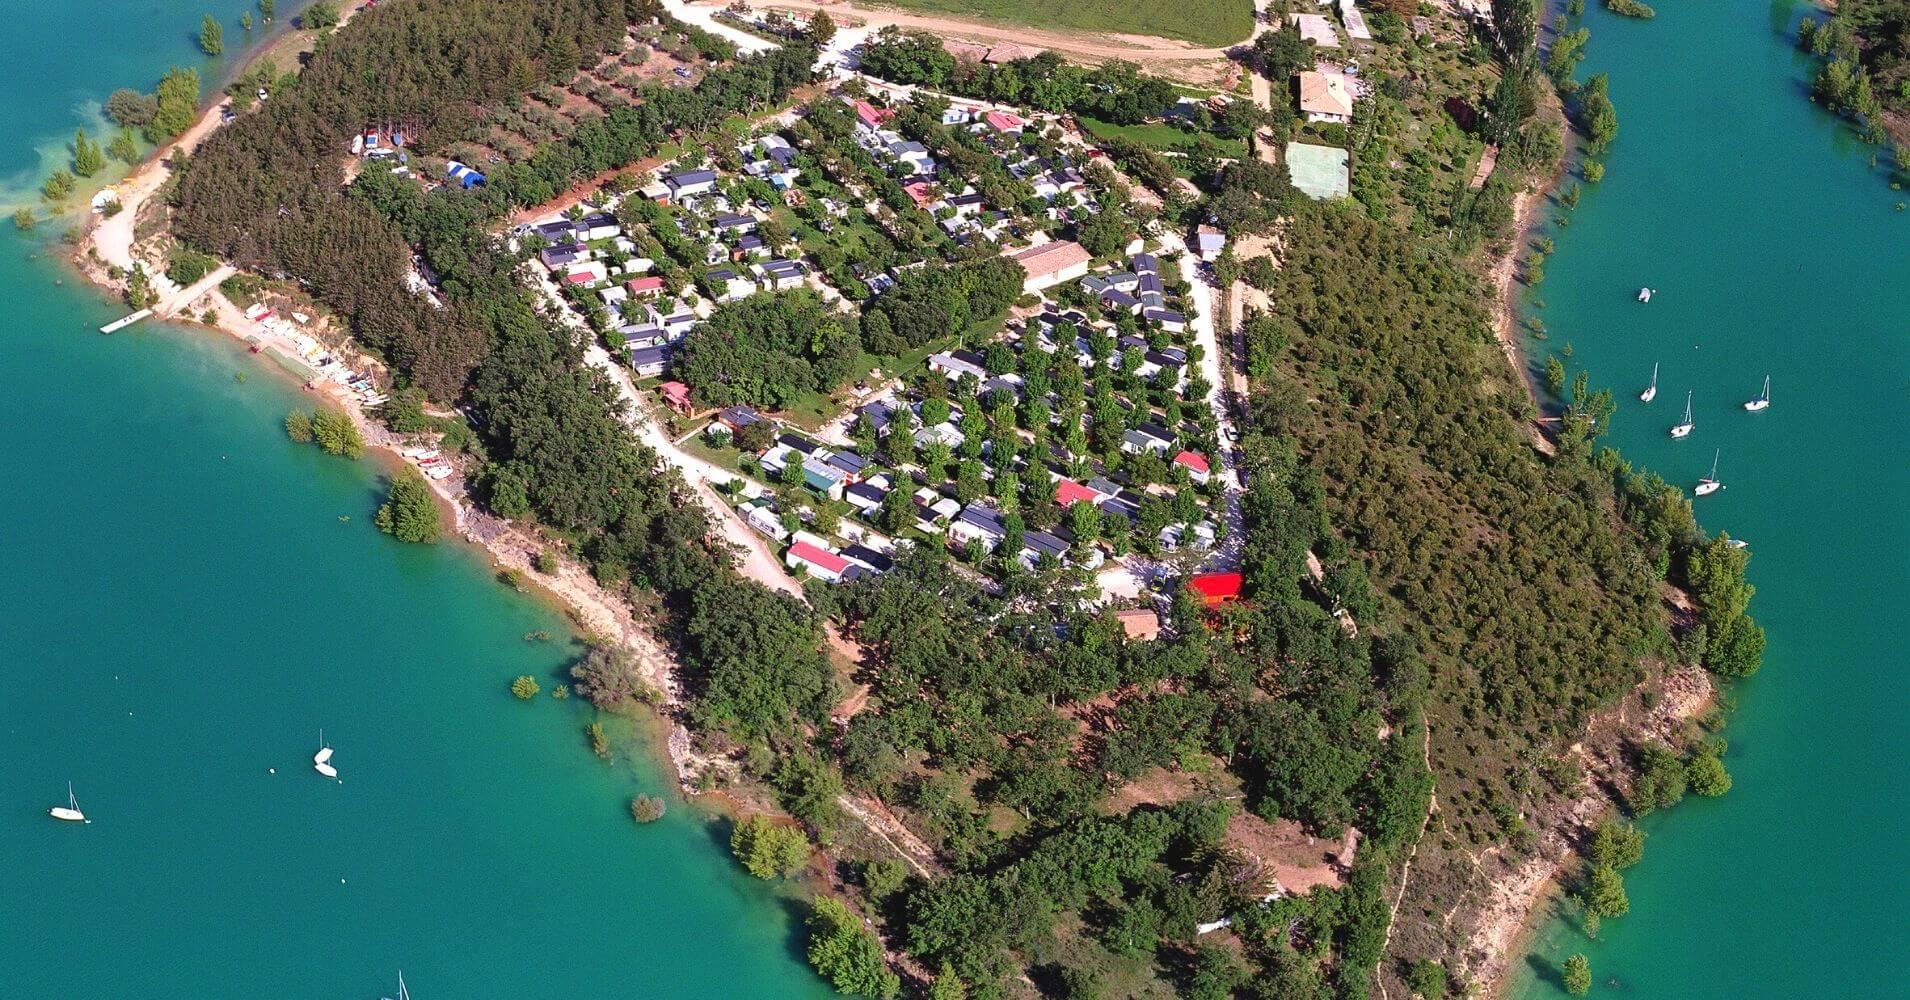 Vistas Panorámicas Aéreas del Camping Aritzaleku. Lerate, Navarra.